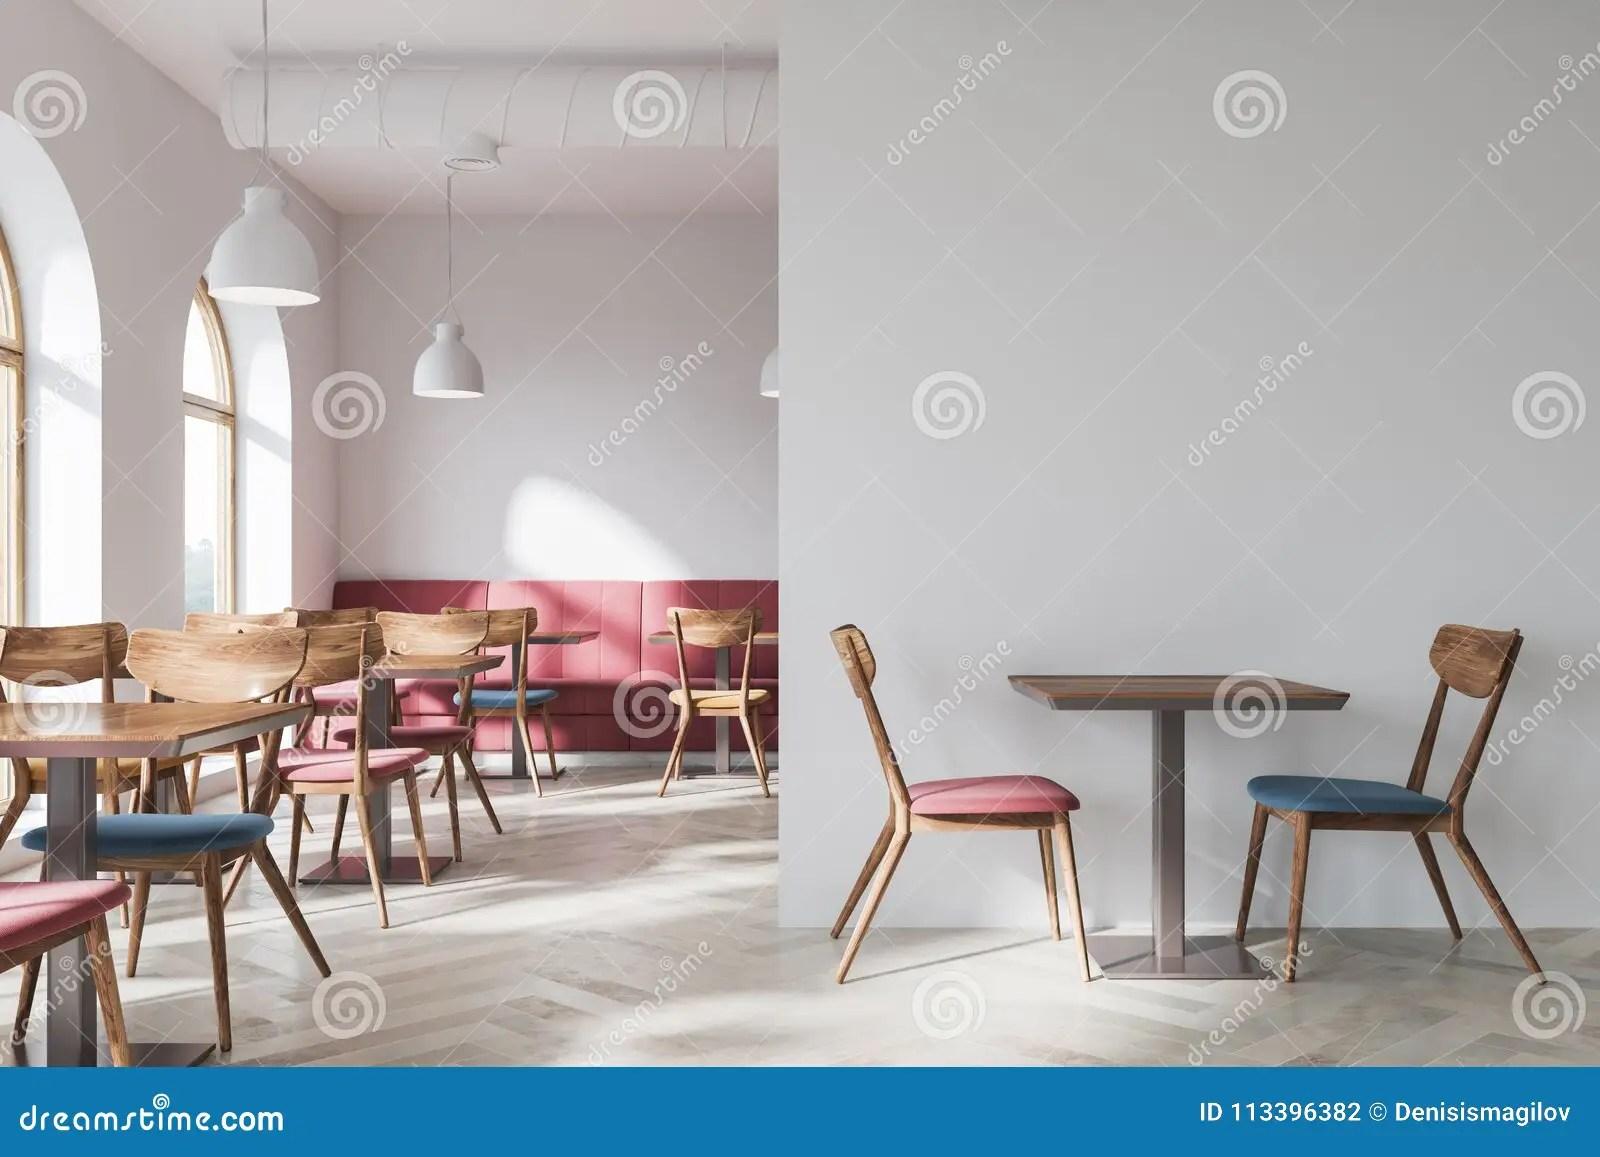 red sofa cafe baku best price on sofas white interior side view stock illustration